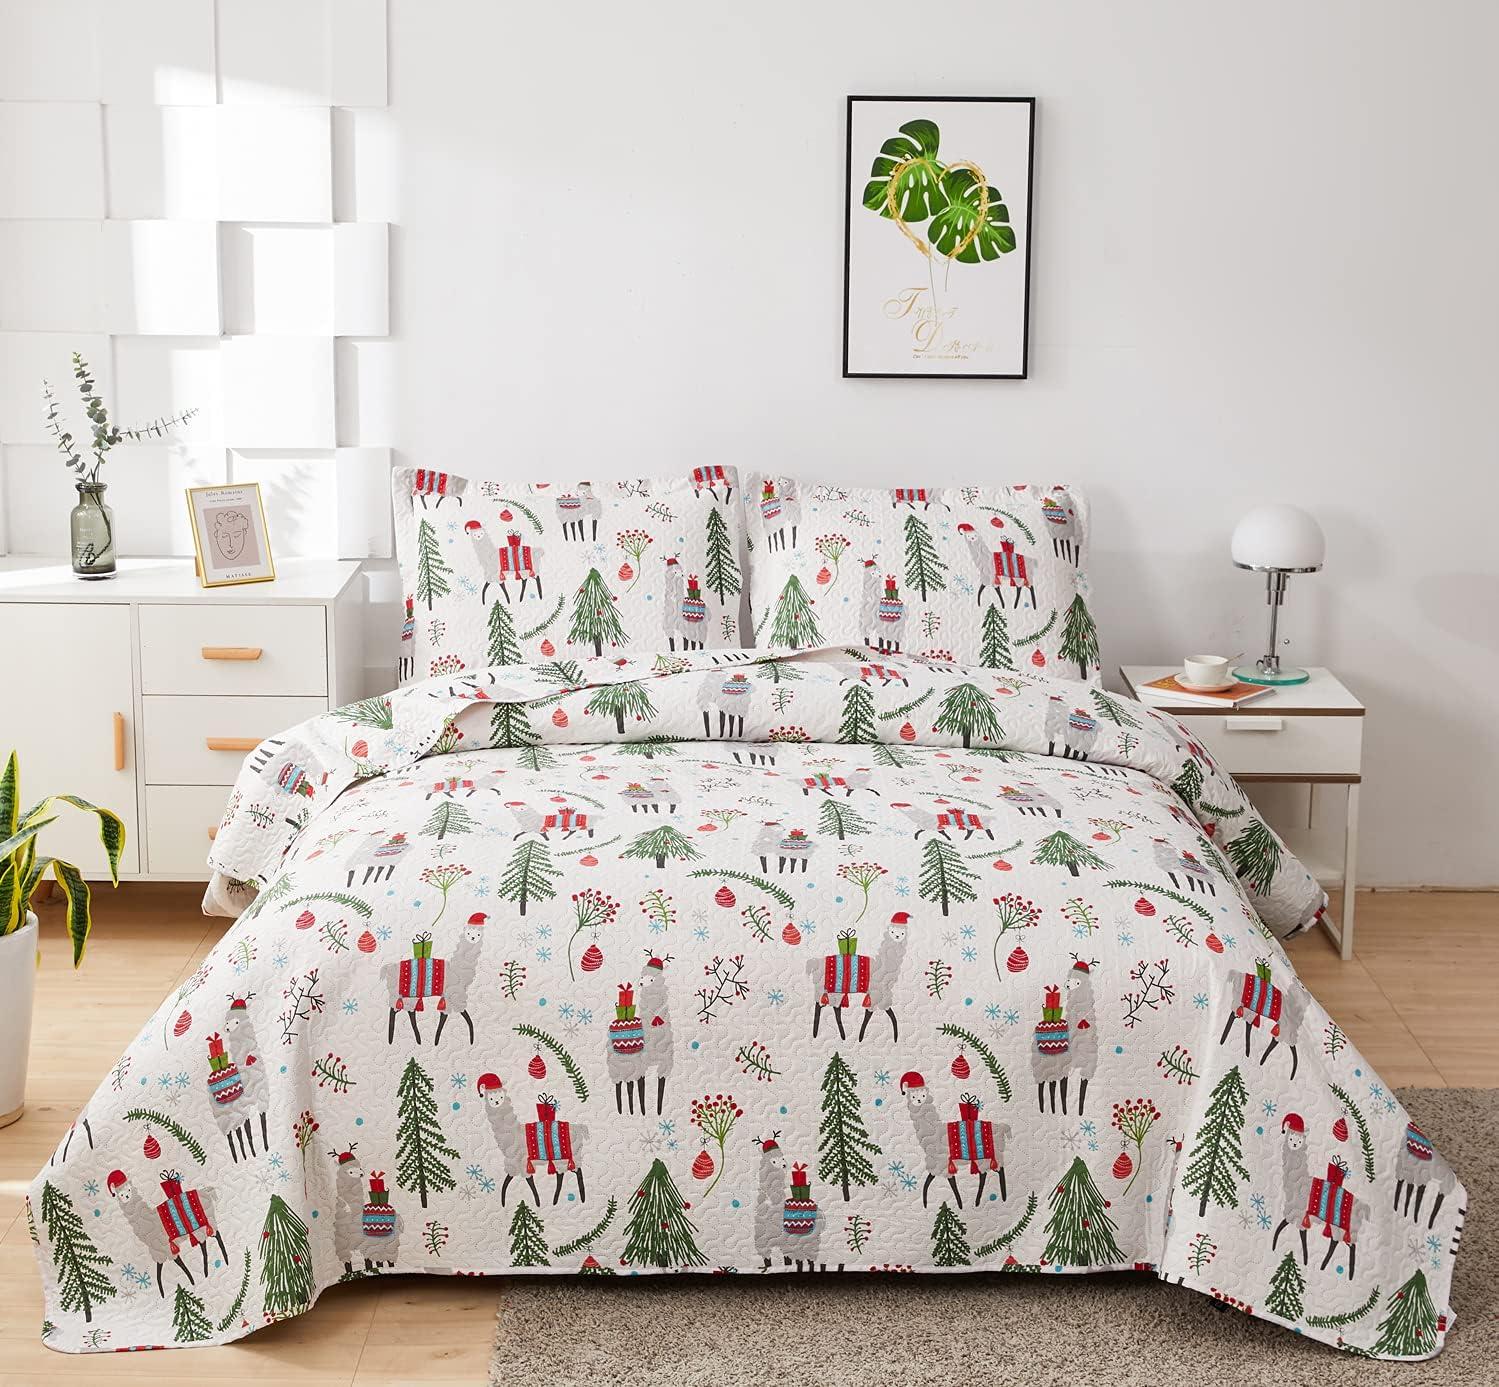 Kids Girls Popular brand in the world Alpaca Cactus Quilt Set Christmas Genuine Size Twin Bed Llama